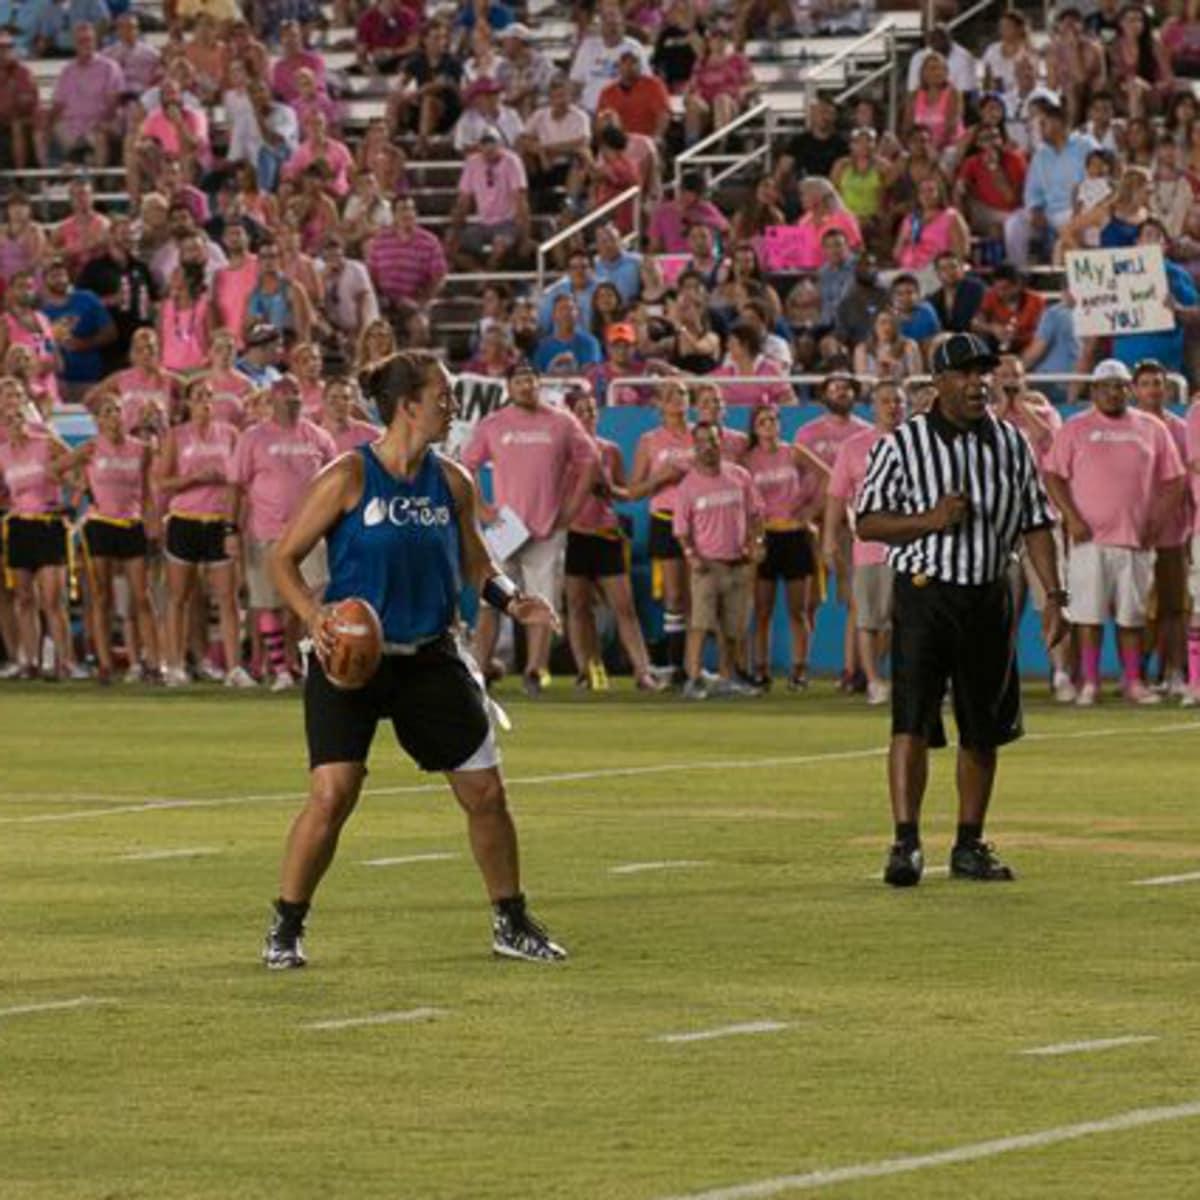 BvB football game at the Cotton Bowl